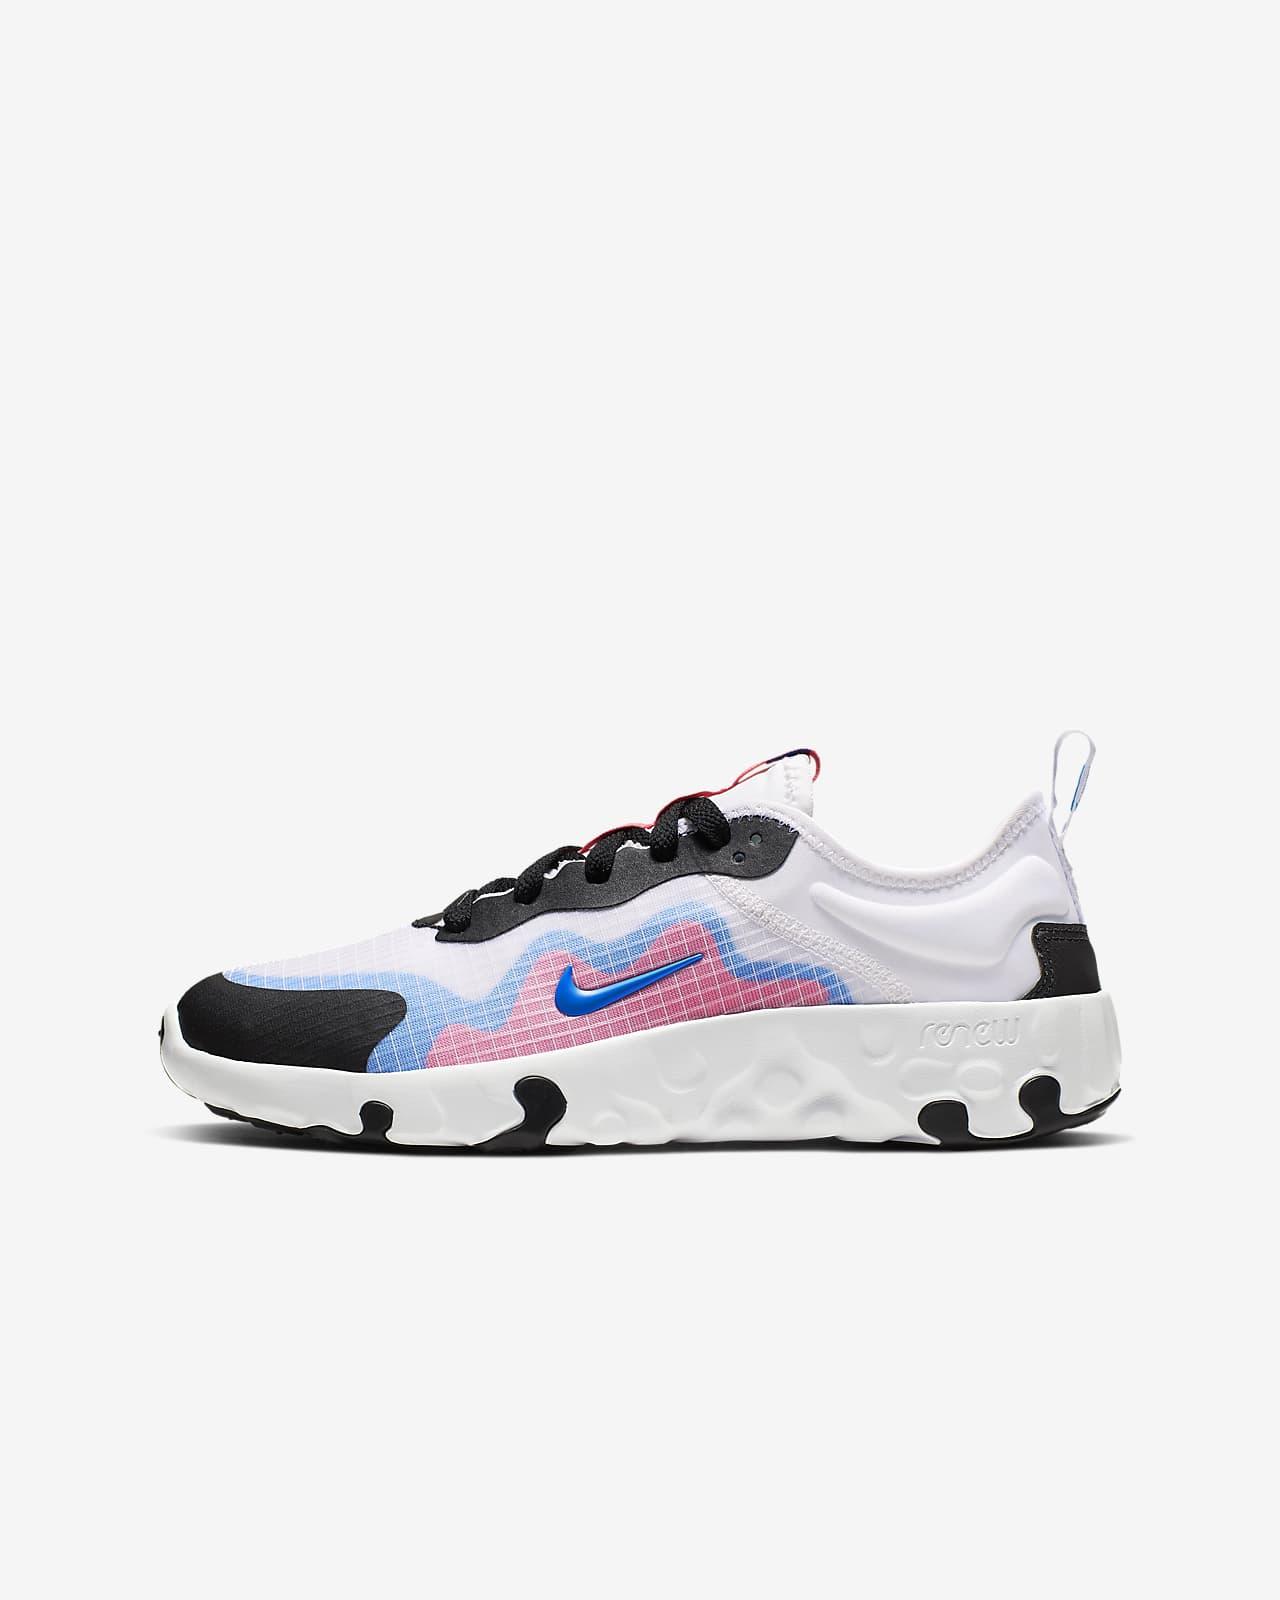 Nike Renew Lucent Older Kids' Shoe. Nike LU